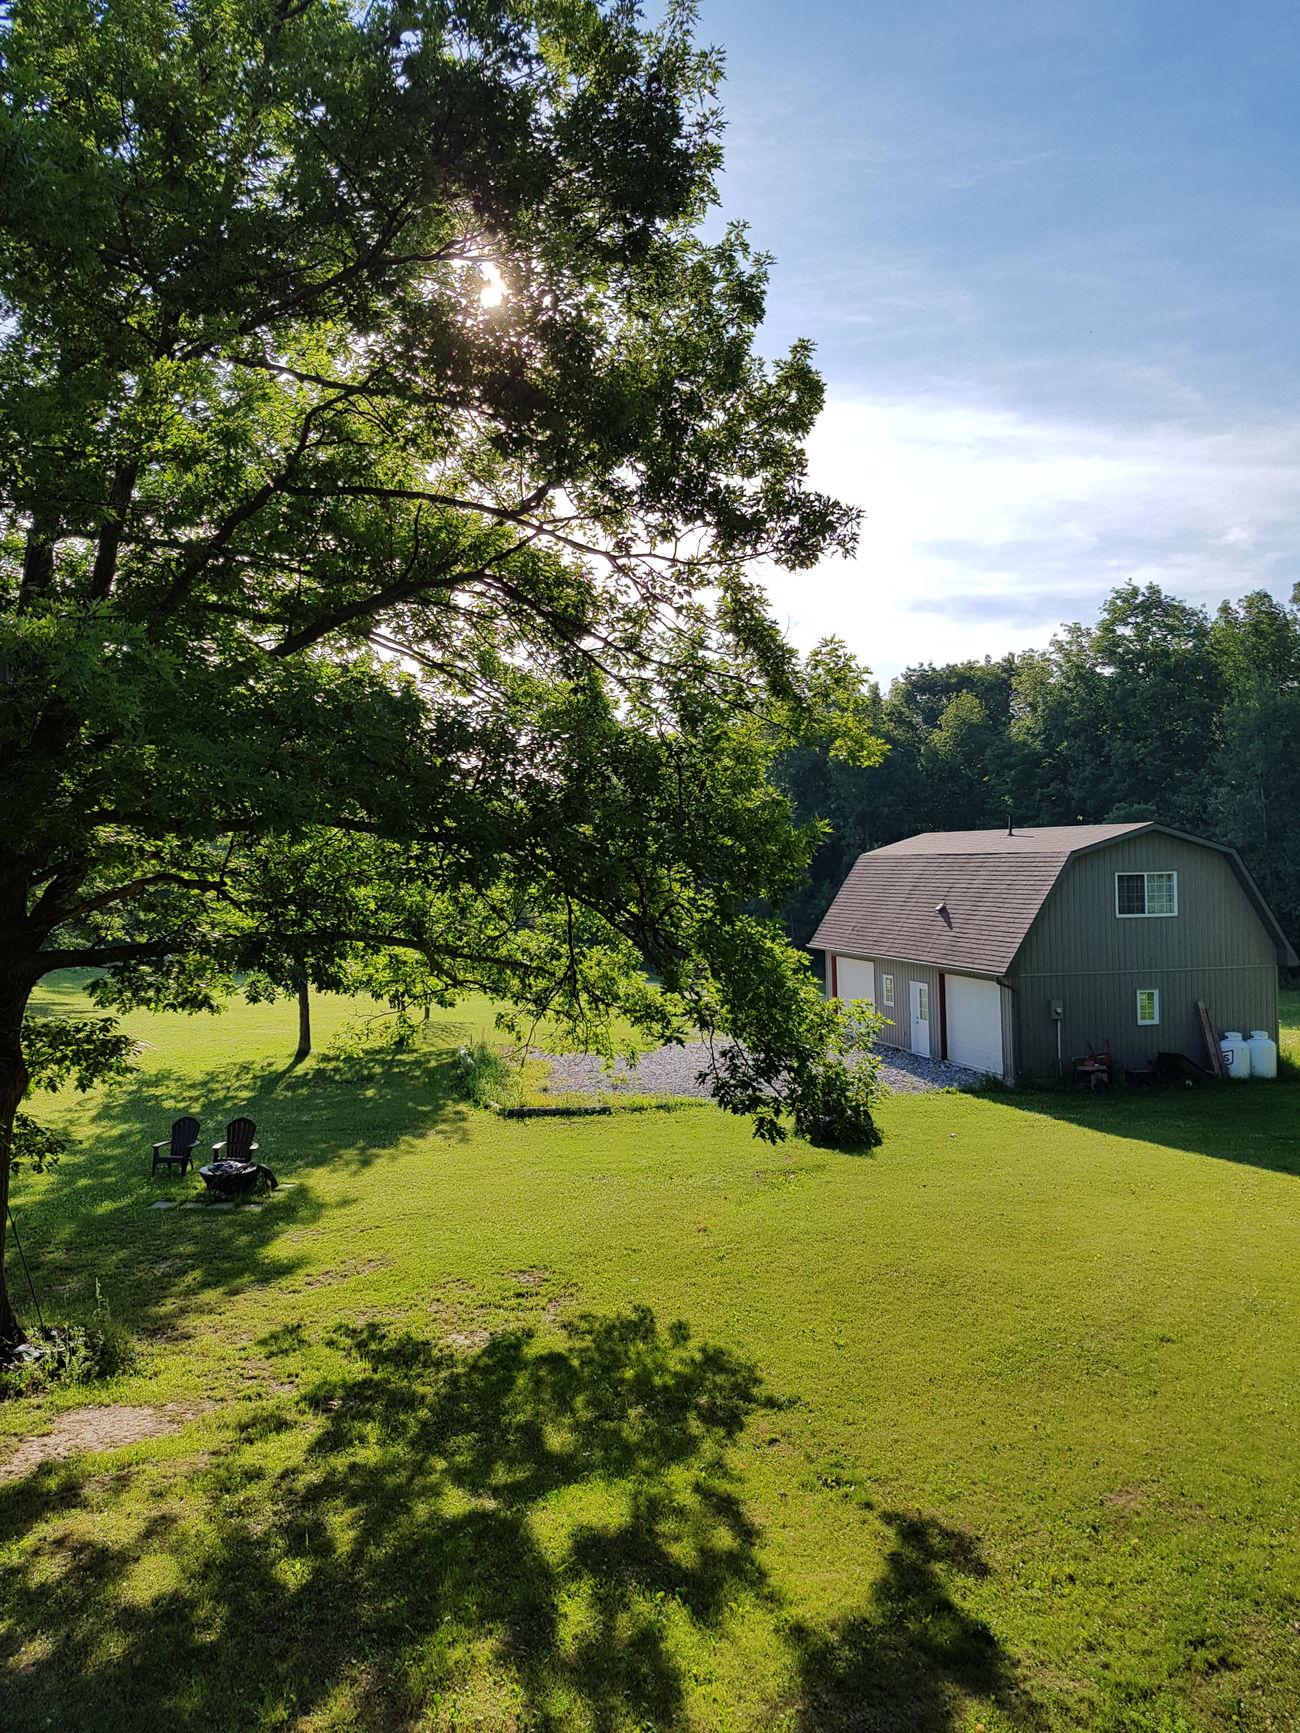 The back yard (side yard) ☺